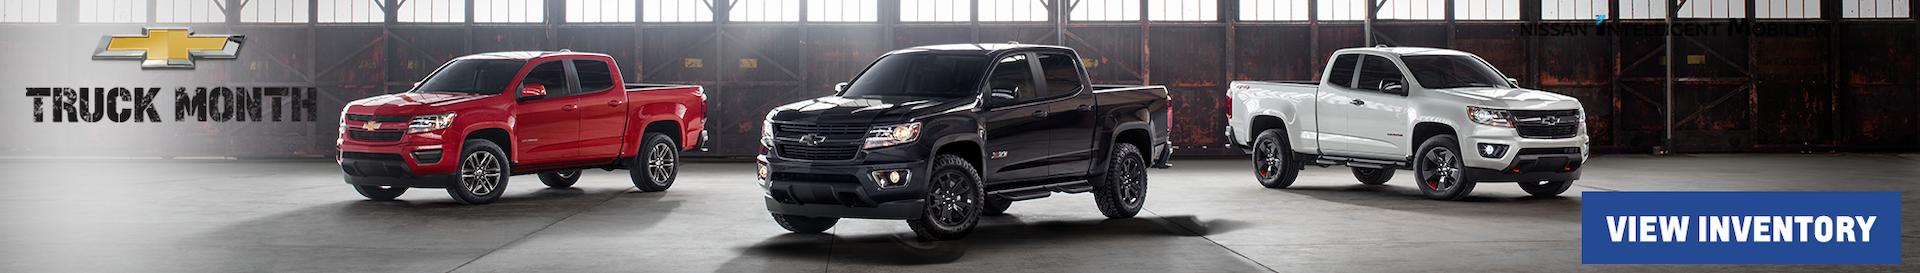 2019 Chevrolet Truck Month